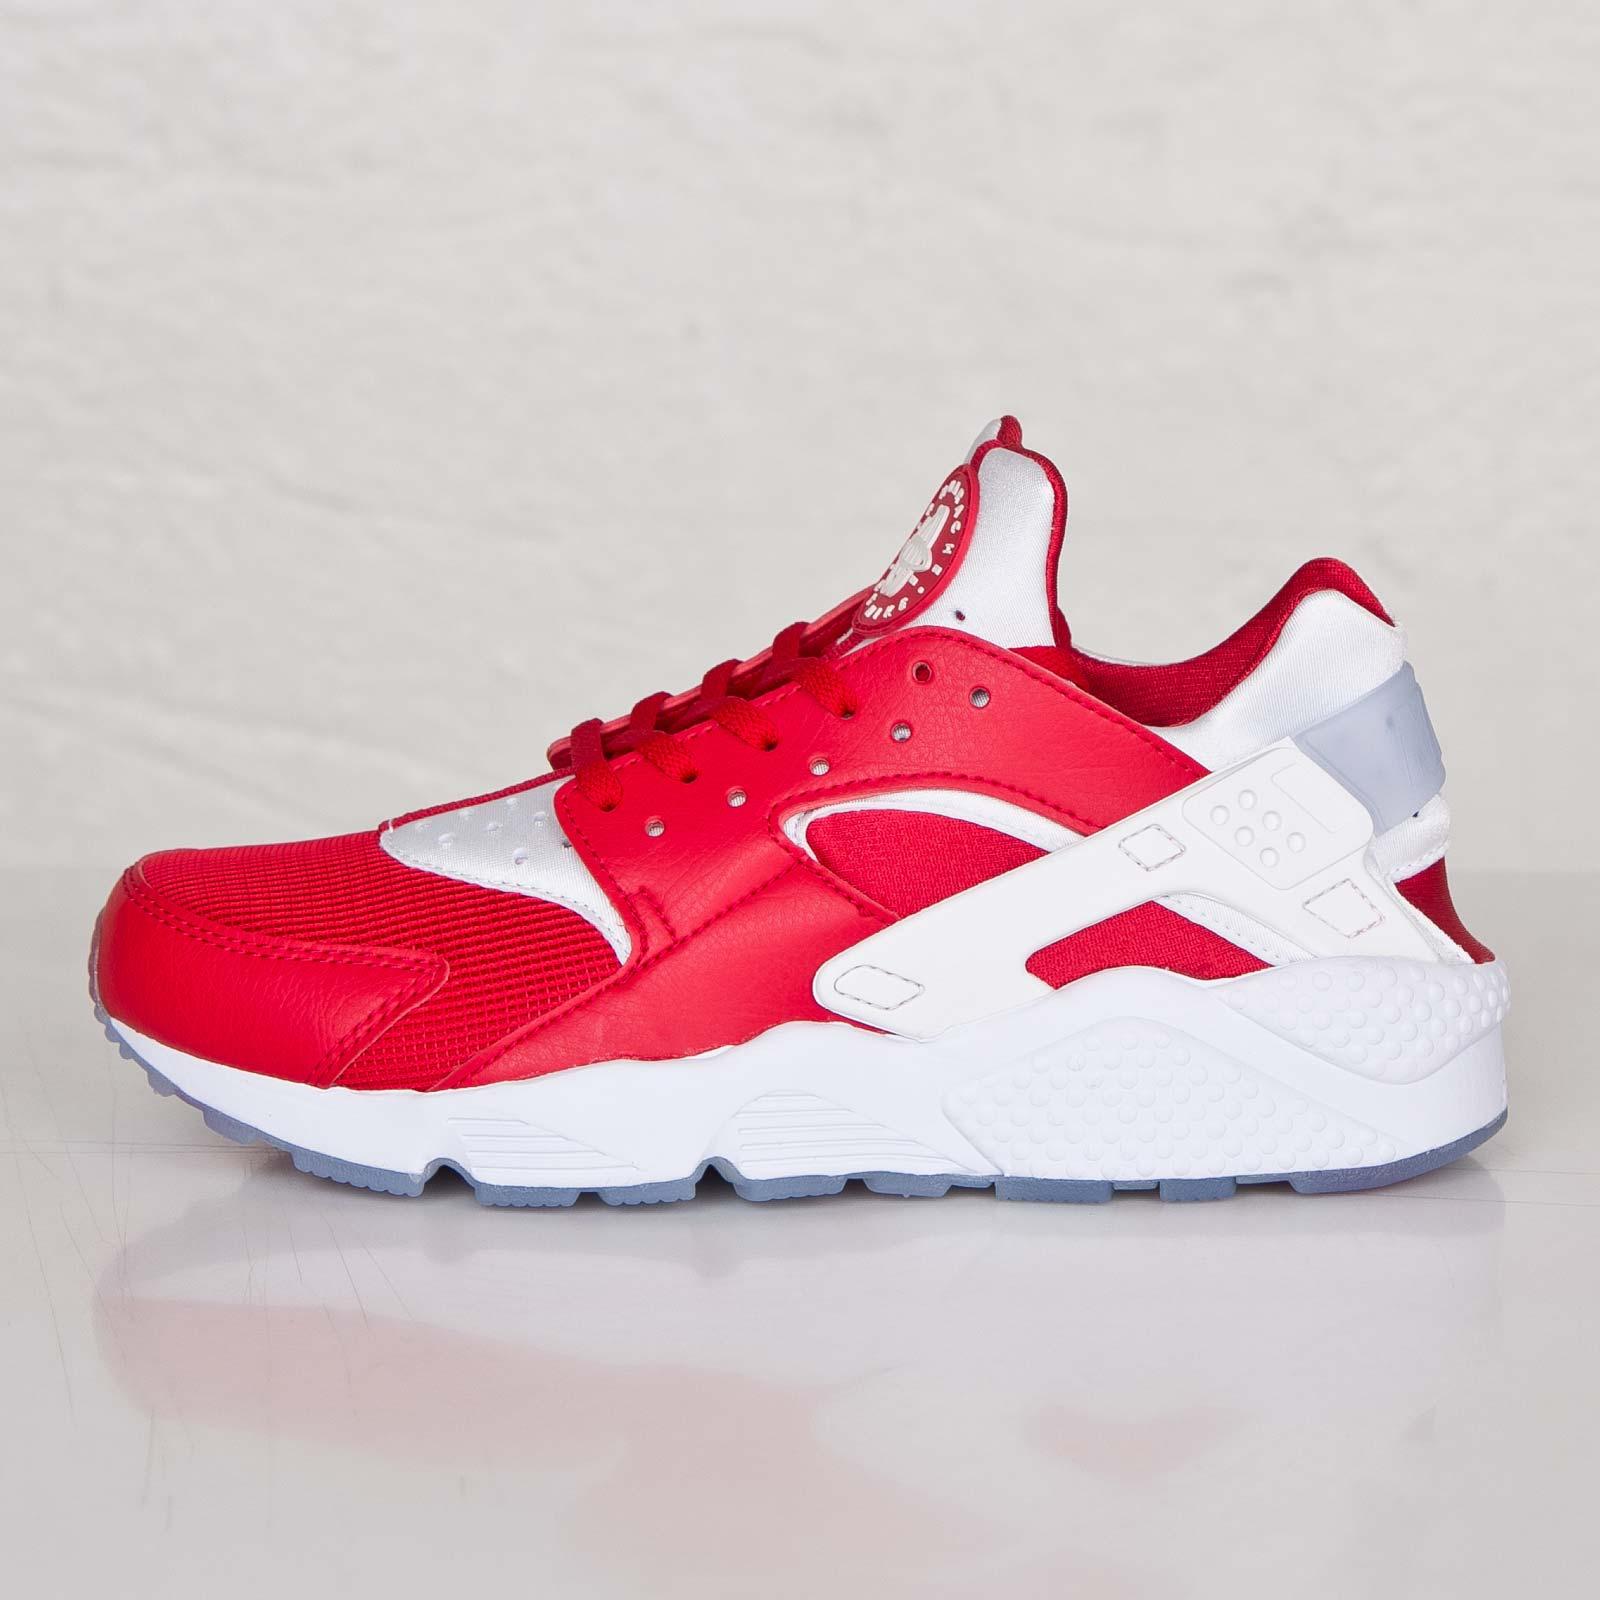 reputable site e521b 99f22 Nike Air Huarache Run Premium - 6. Close